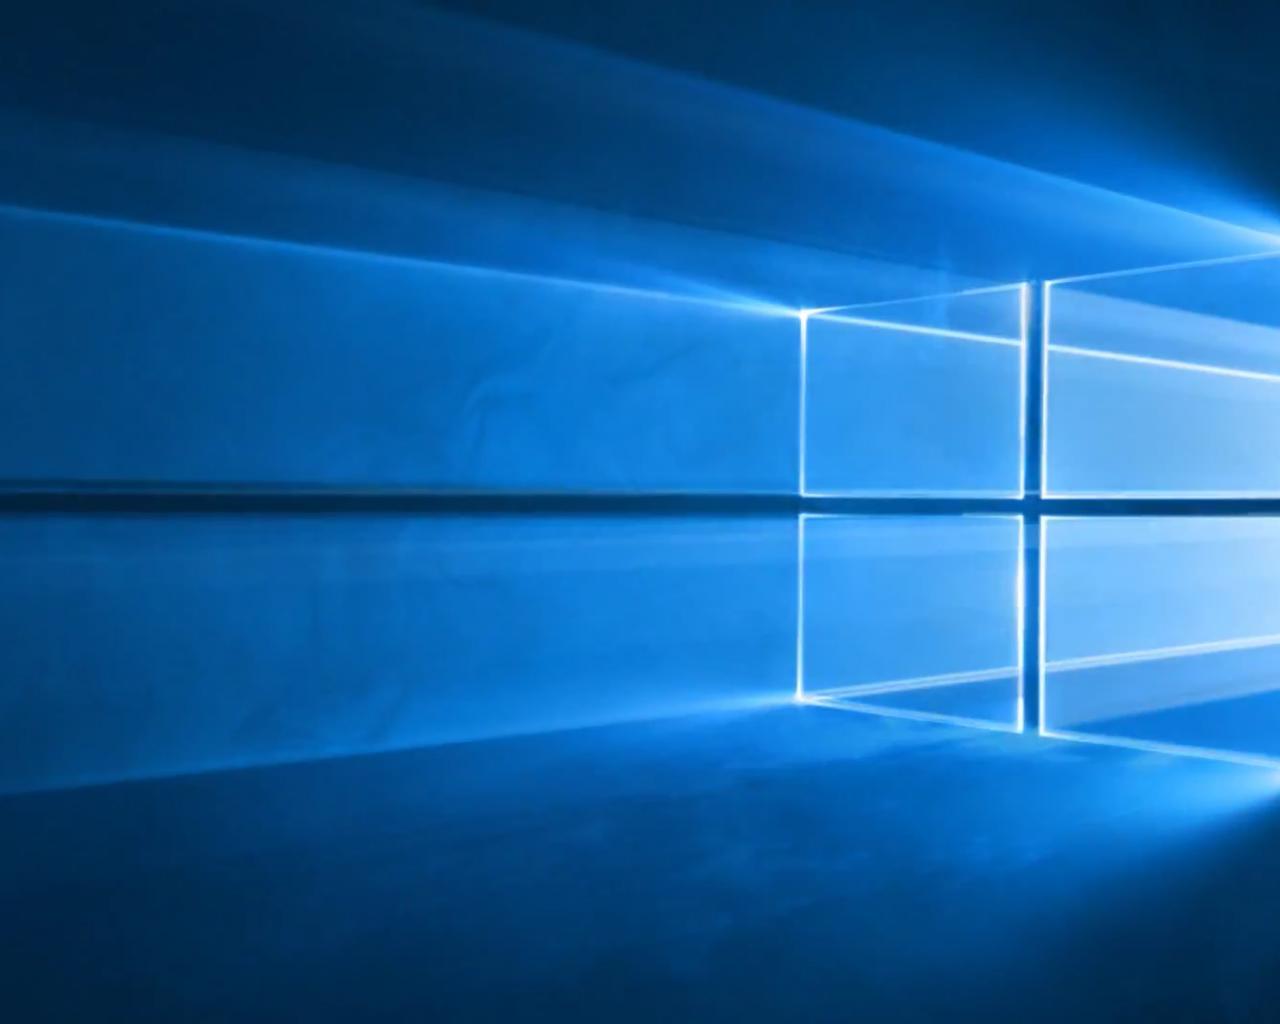 Free Download Net Microsoft Showcases Windows 10 Hero Wallpaper